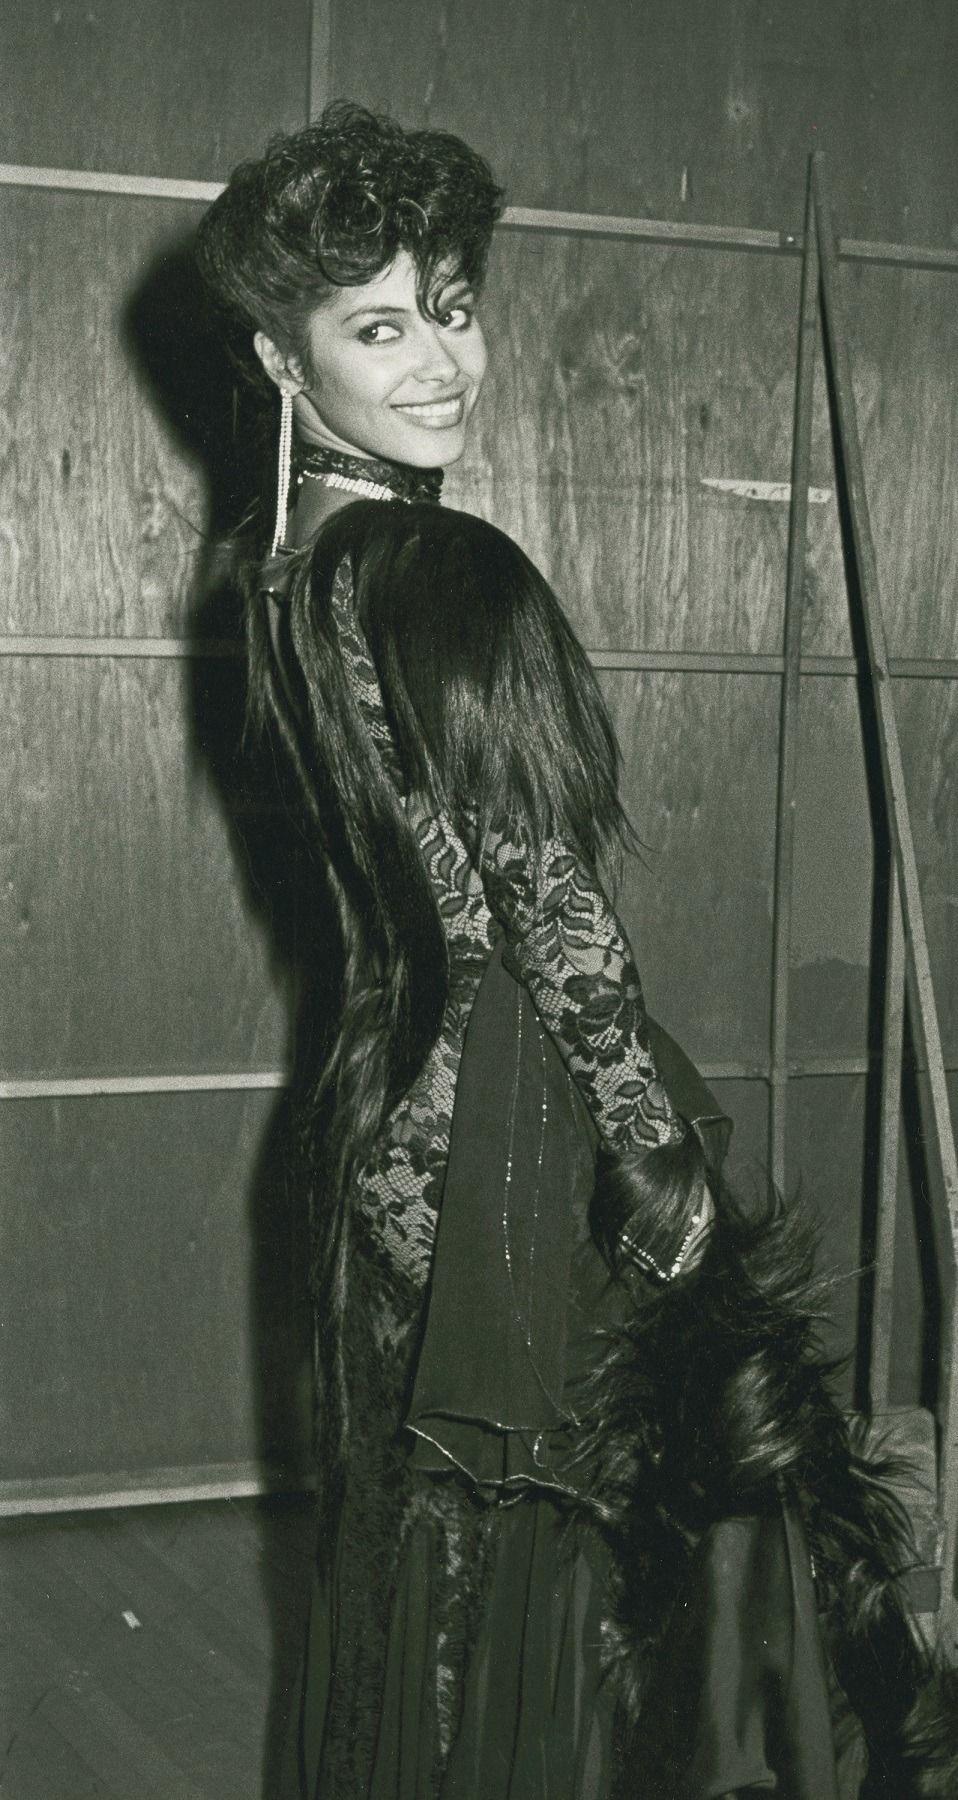 Yesgalak  Vanity SingerVanity Nice Shot With The Congo Fur Denise Matthews Pinterest